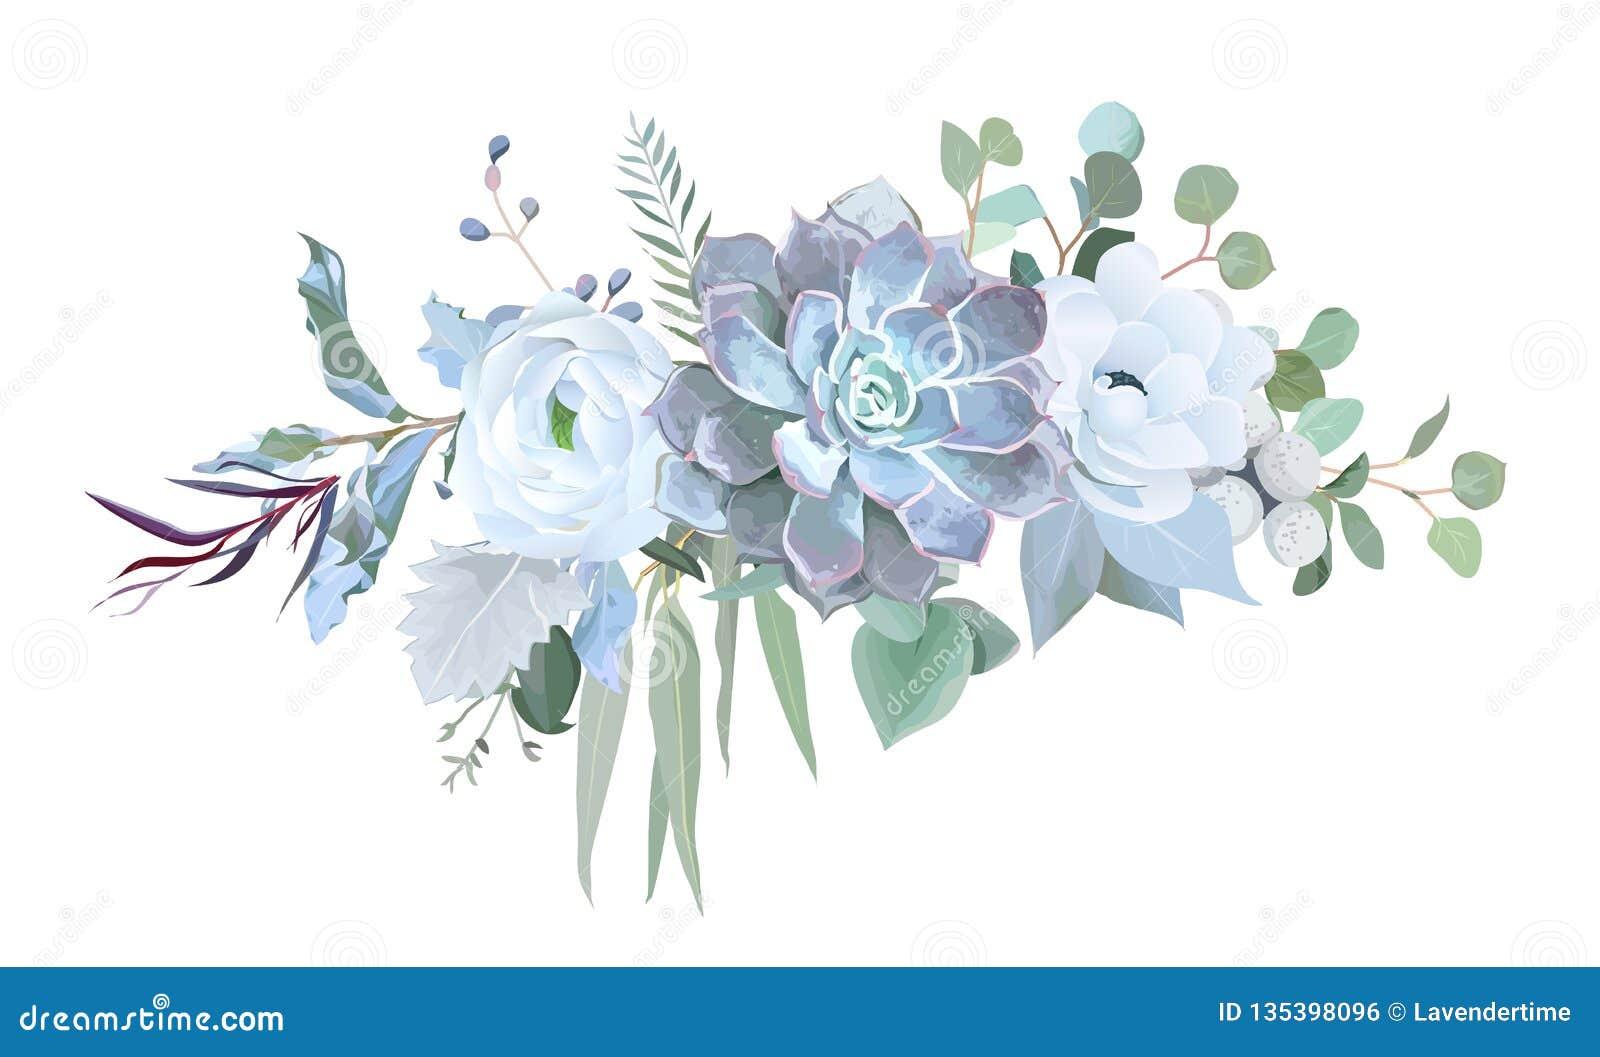 Echeveria azul polvoriento suculento, ranúnculo blanco, anémona, eucal